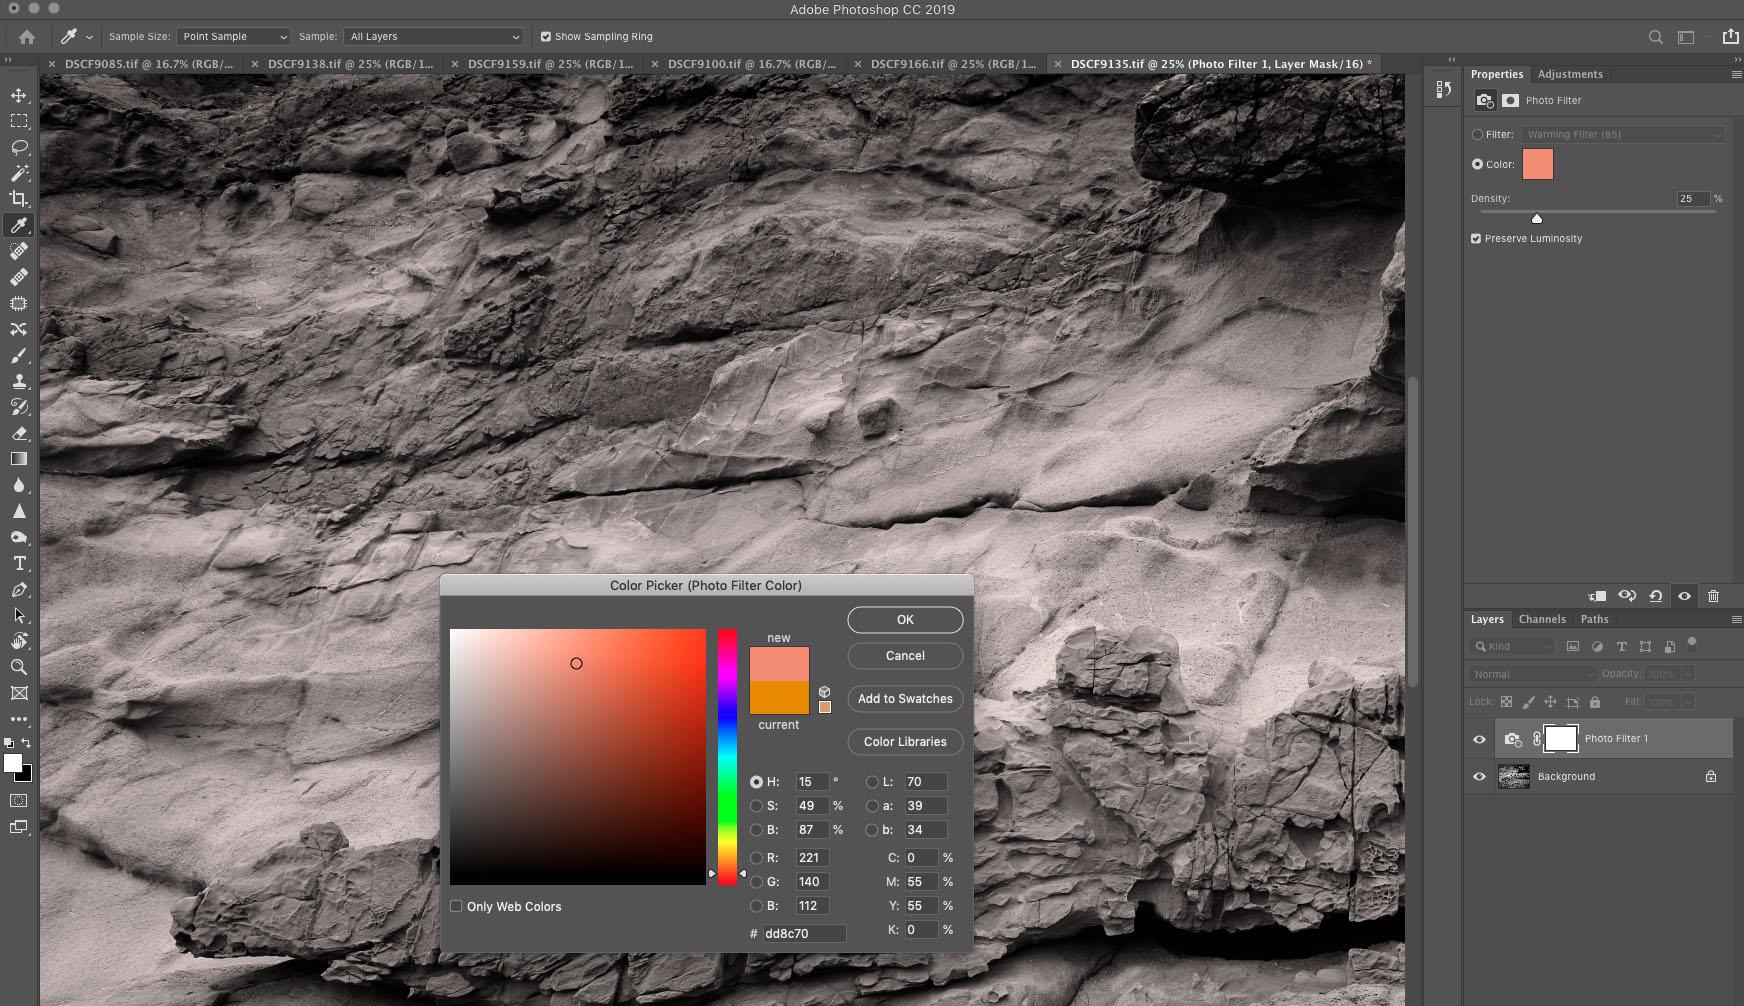 Cyanotype Orange Filter Photoshop